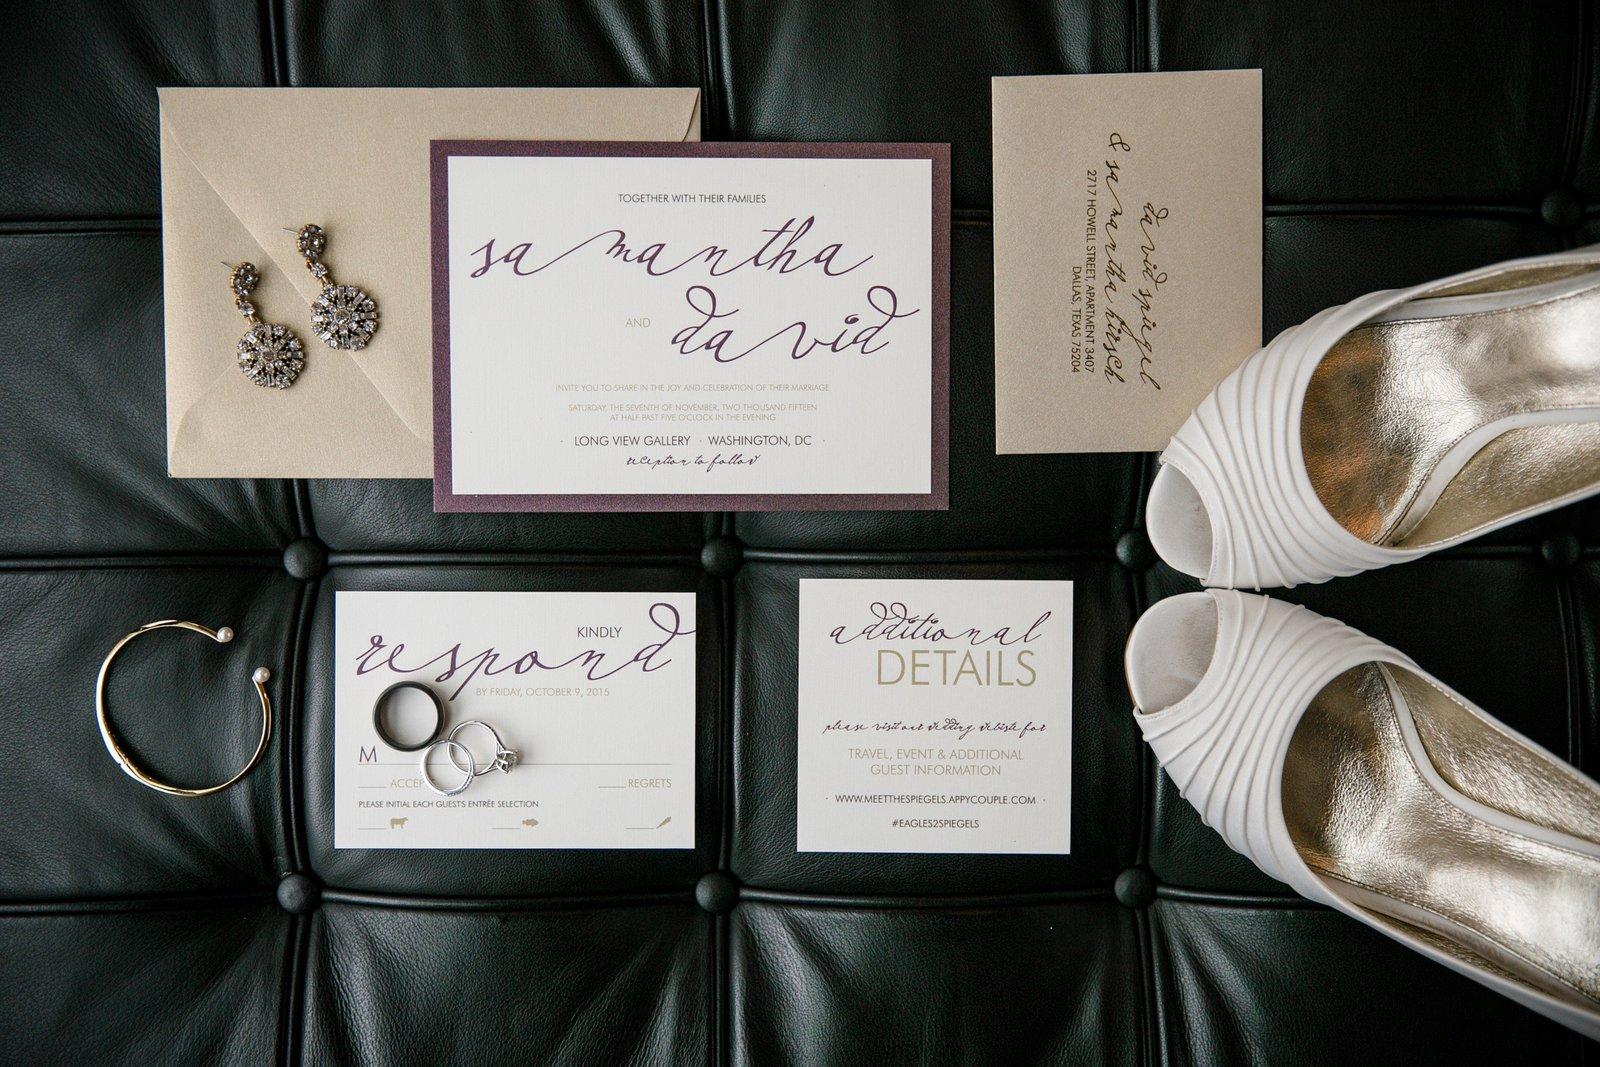 Black-tie-wedding-photos-longview-gallery-dc (101)